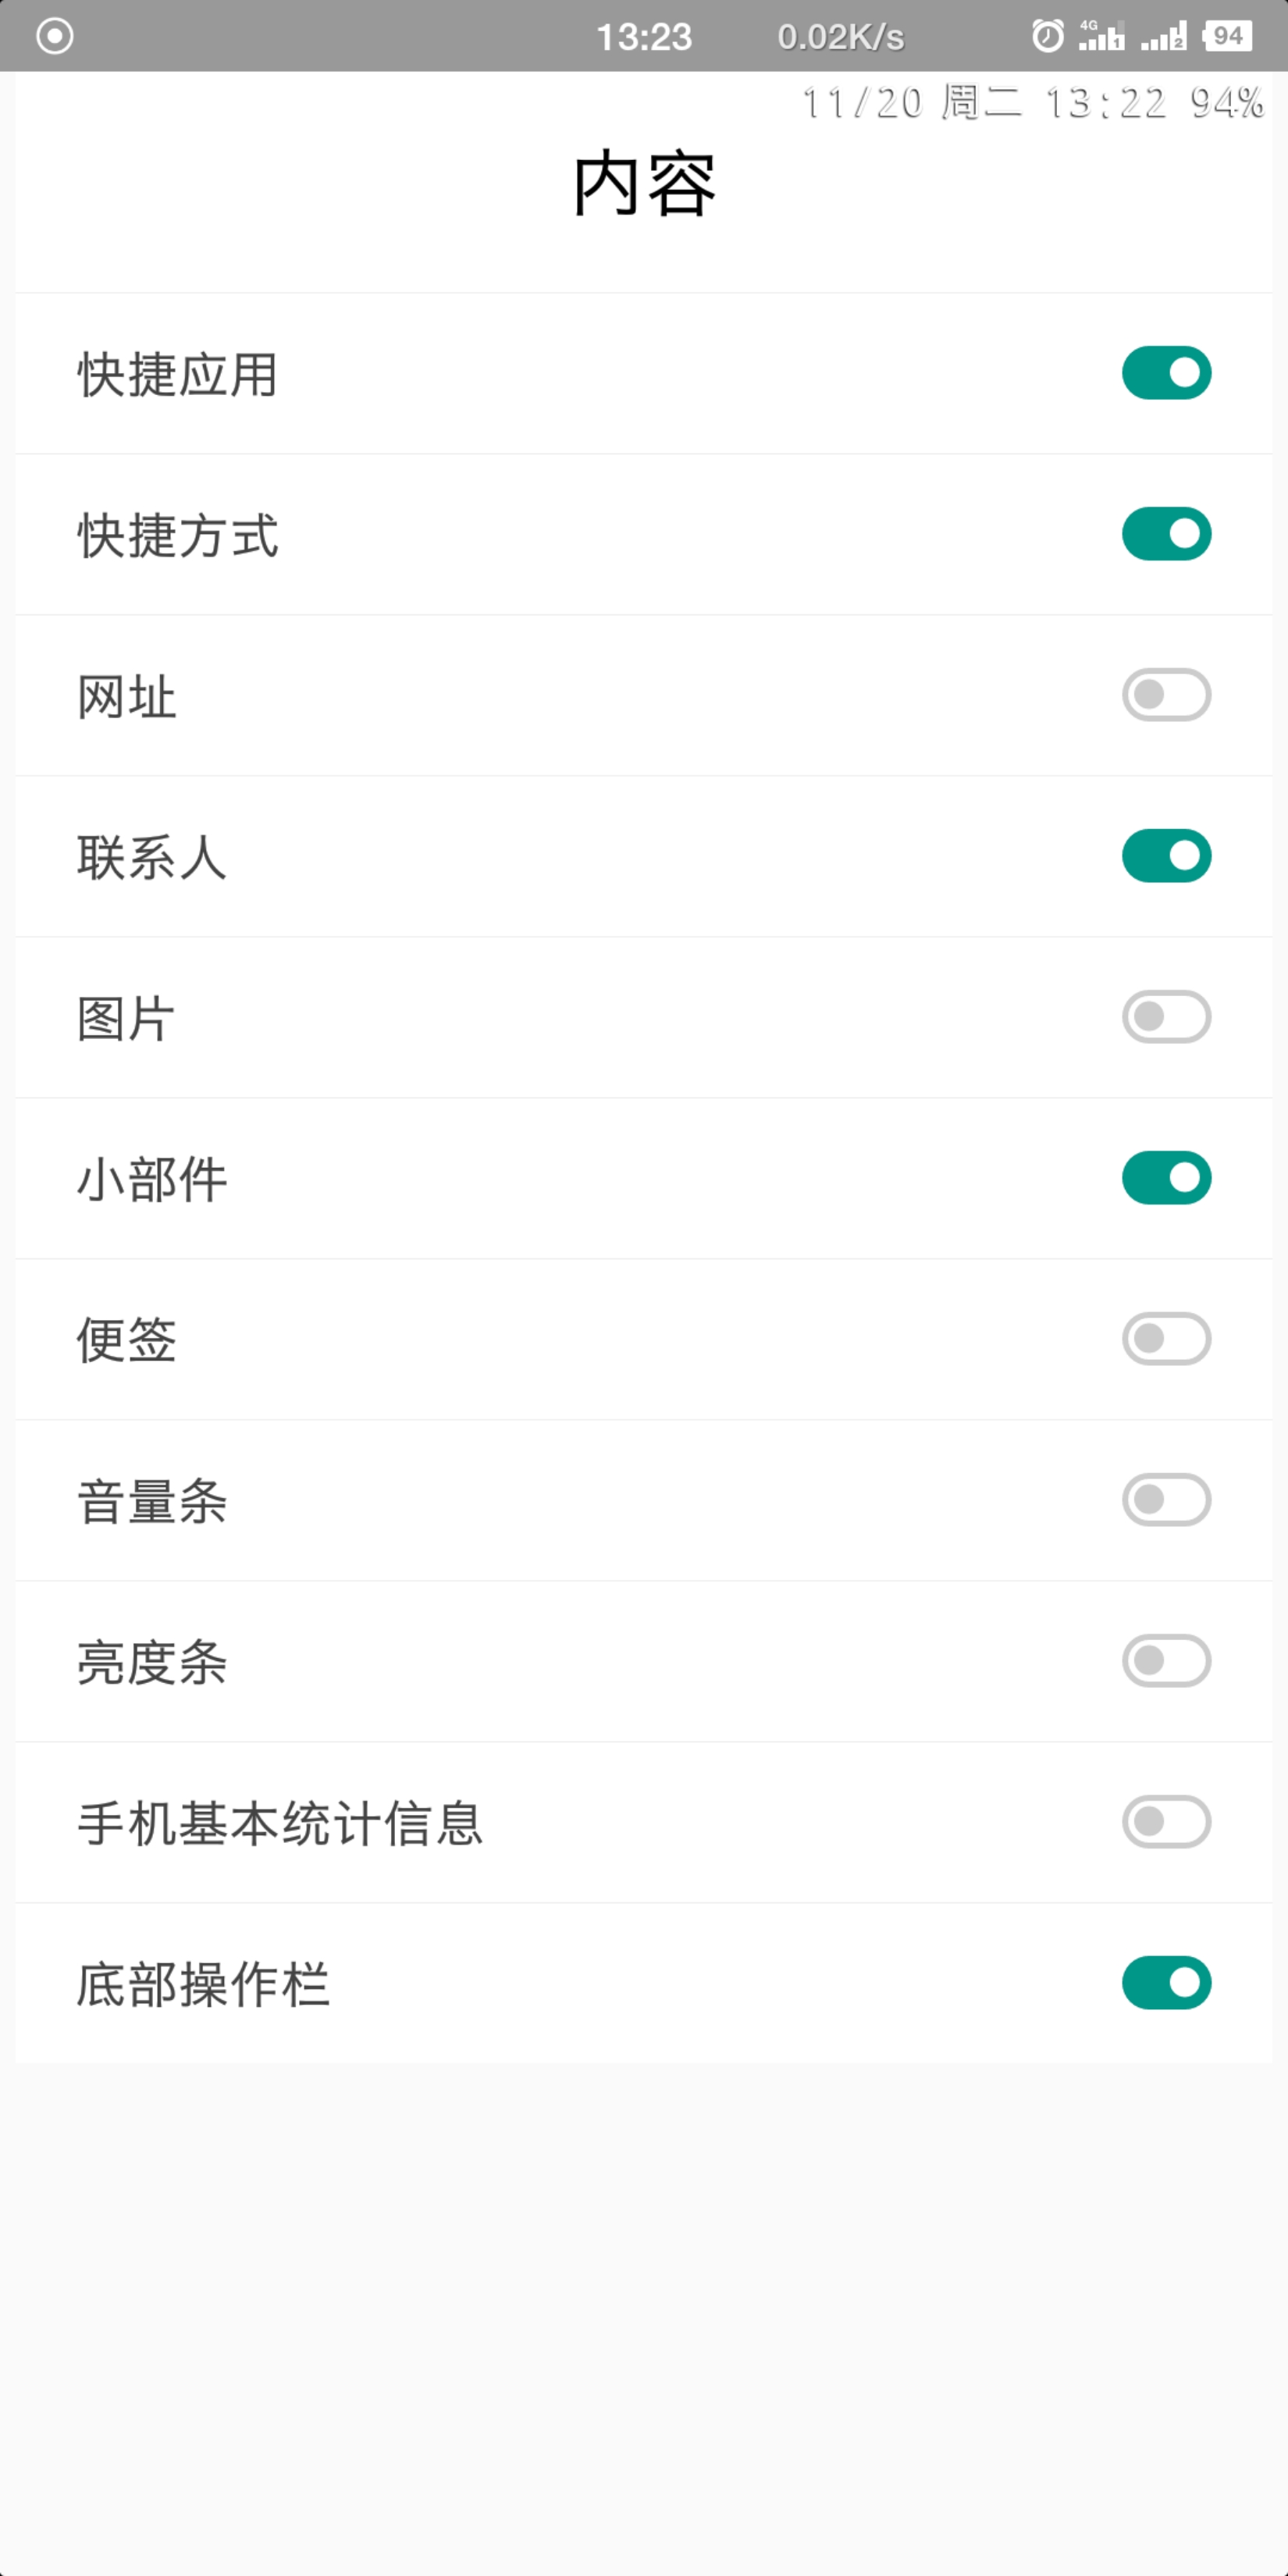 Screenshot_2018-11-20-13-23-05-370_?????.png